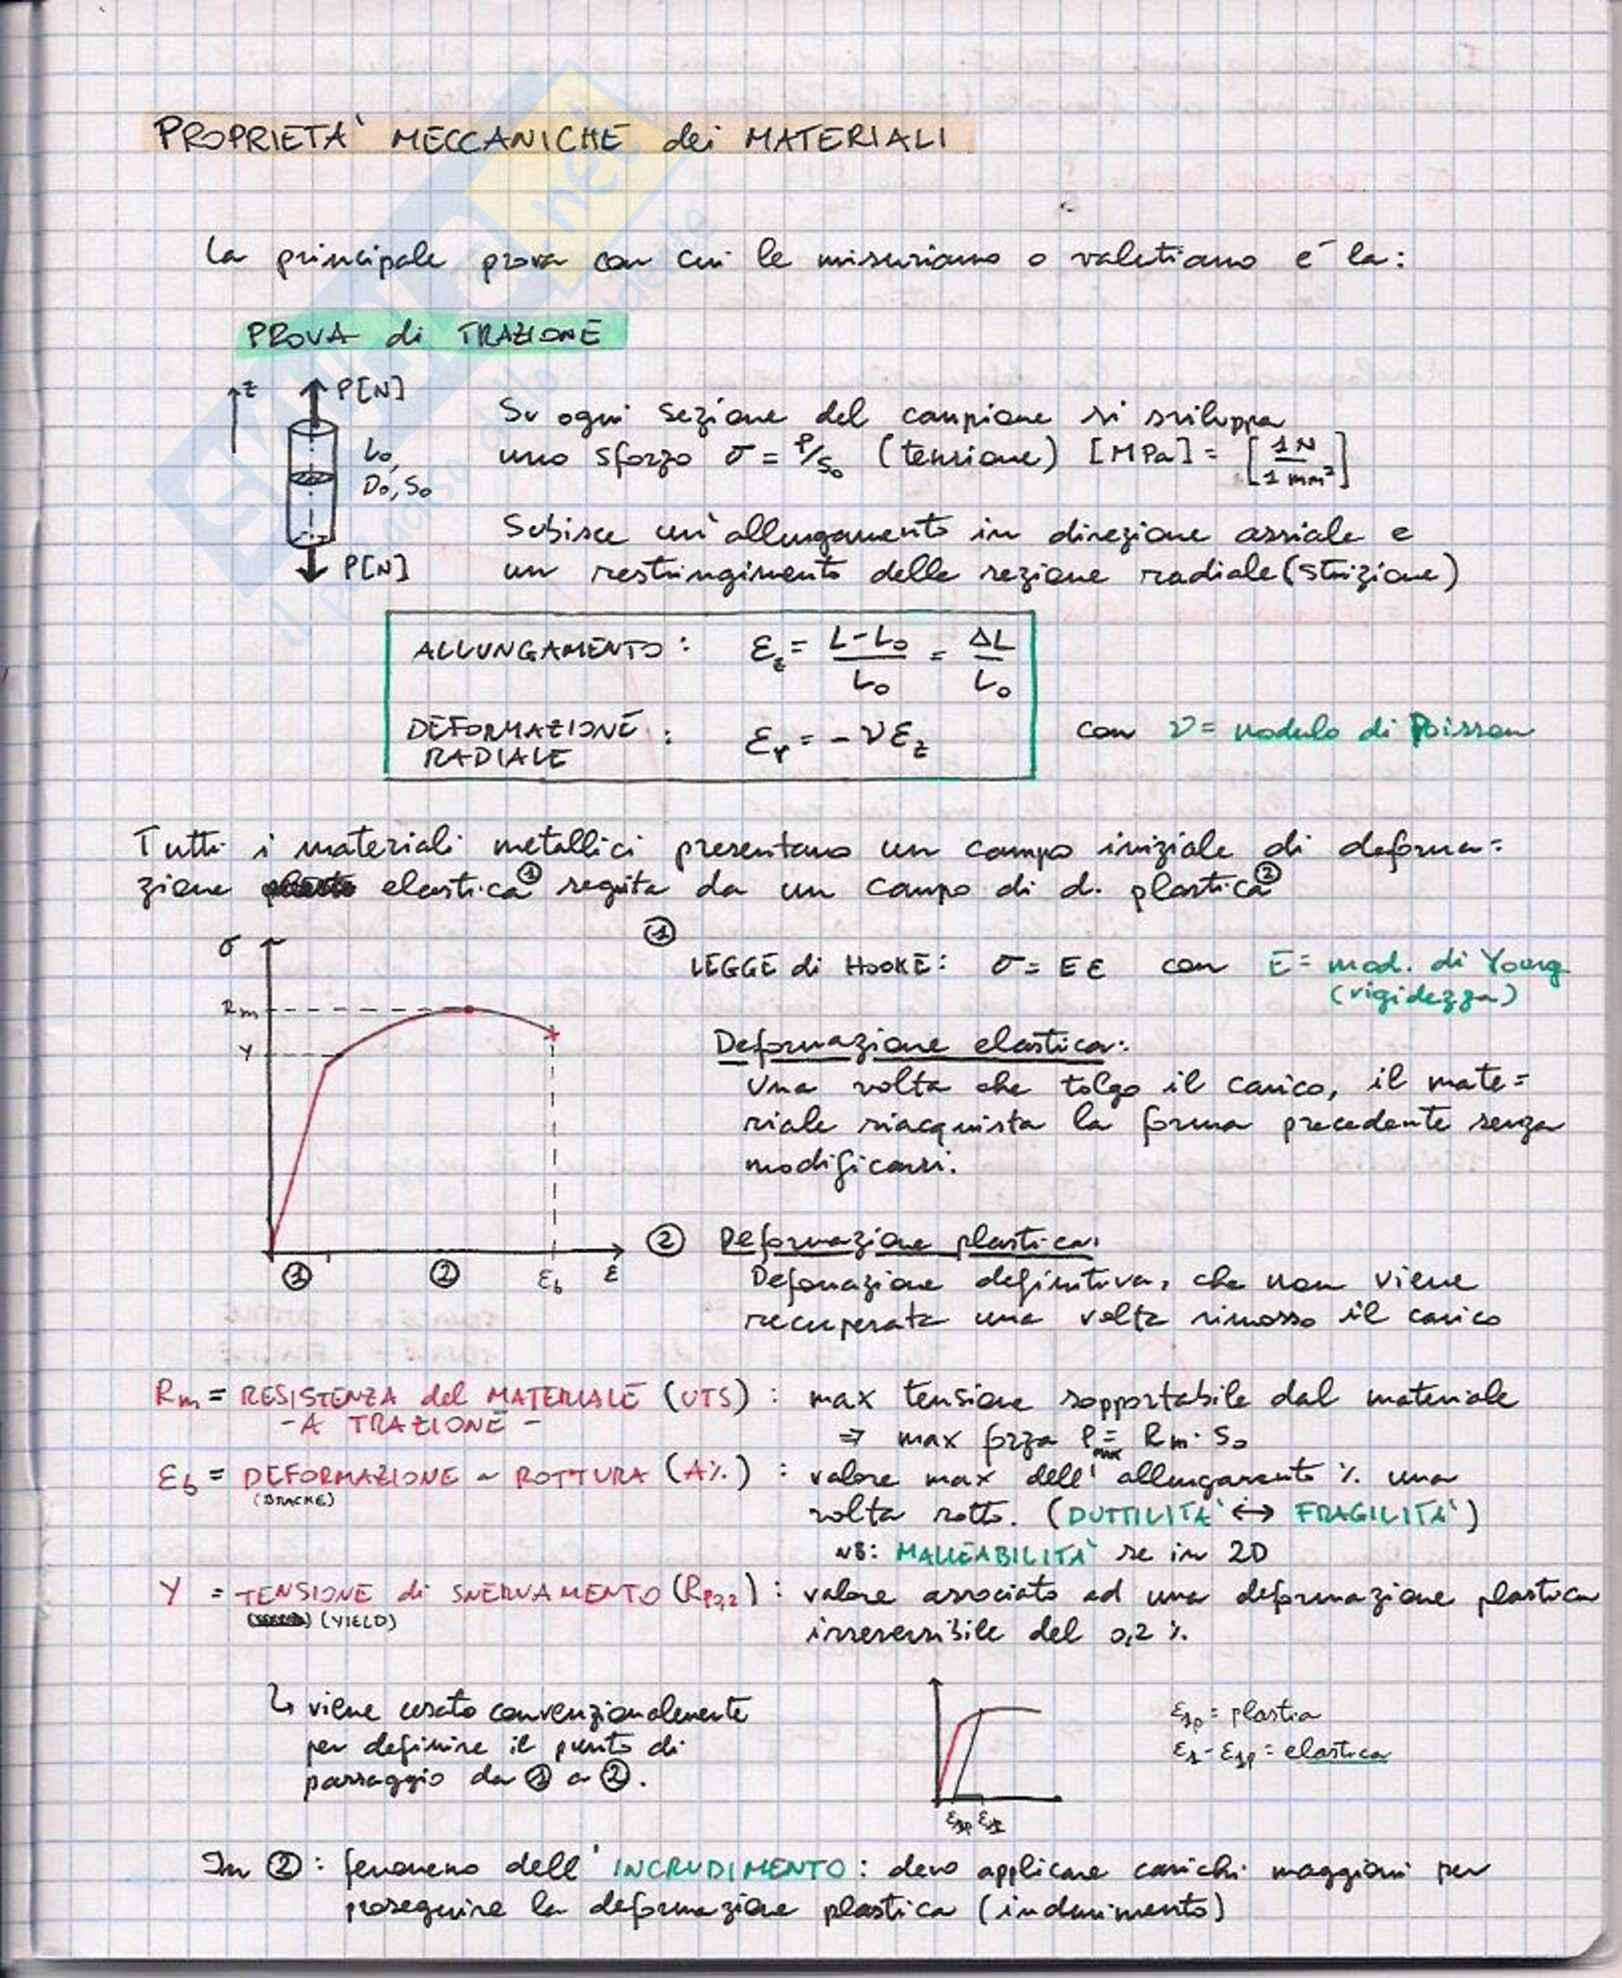 Tecnologia Meccanica Pag. 2